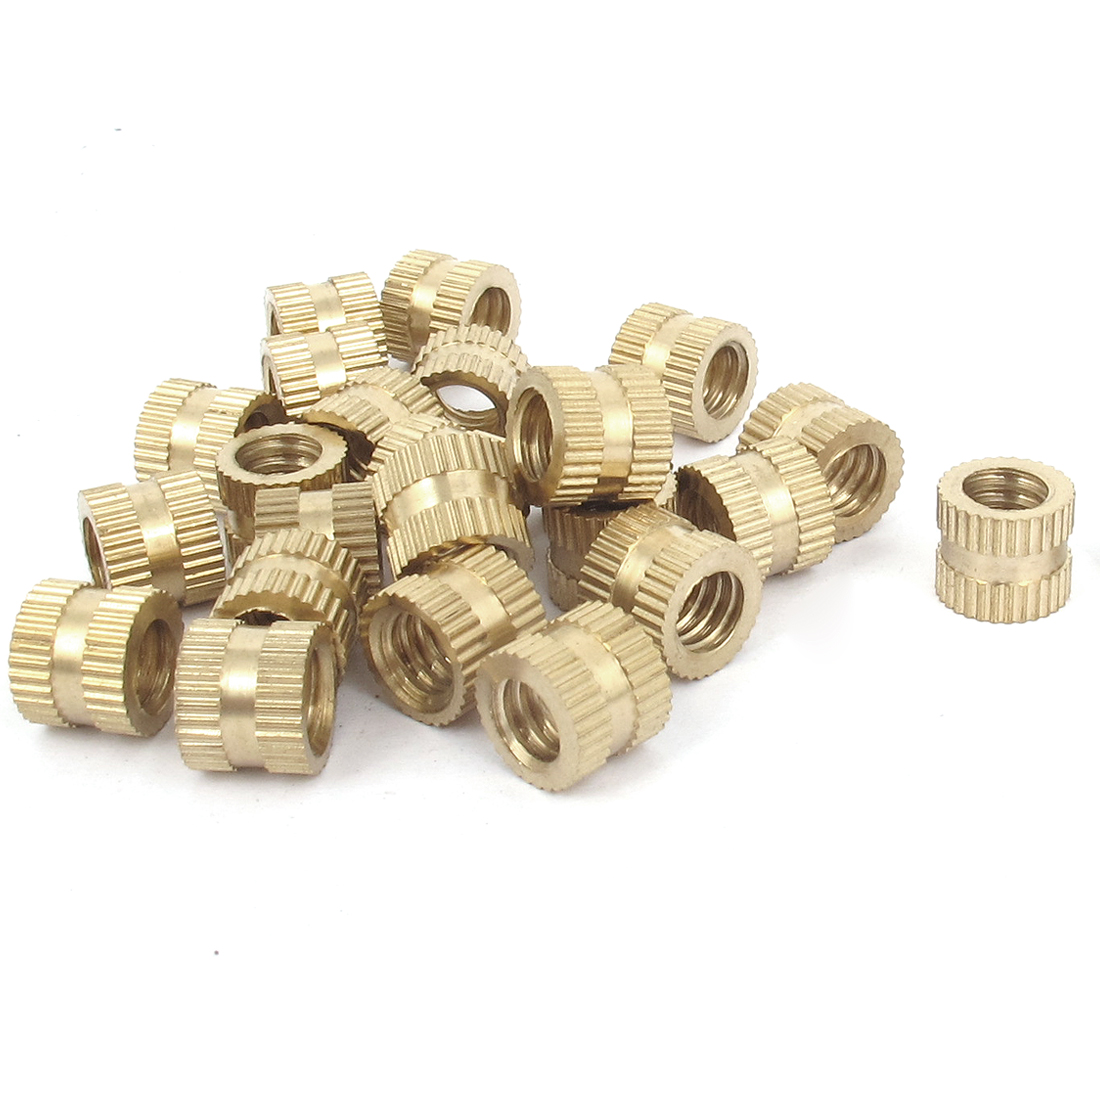 "25 Pcs 1/4""-20 Metric Threaded Brass Knurl Round Insert Nuts"